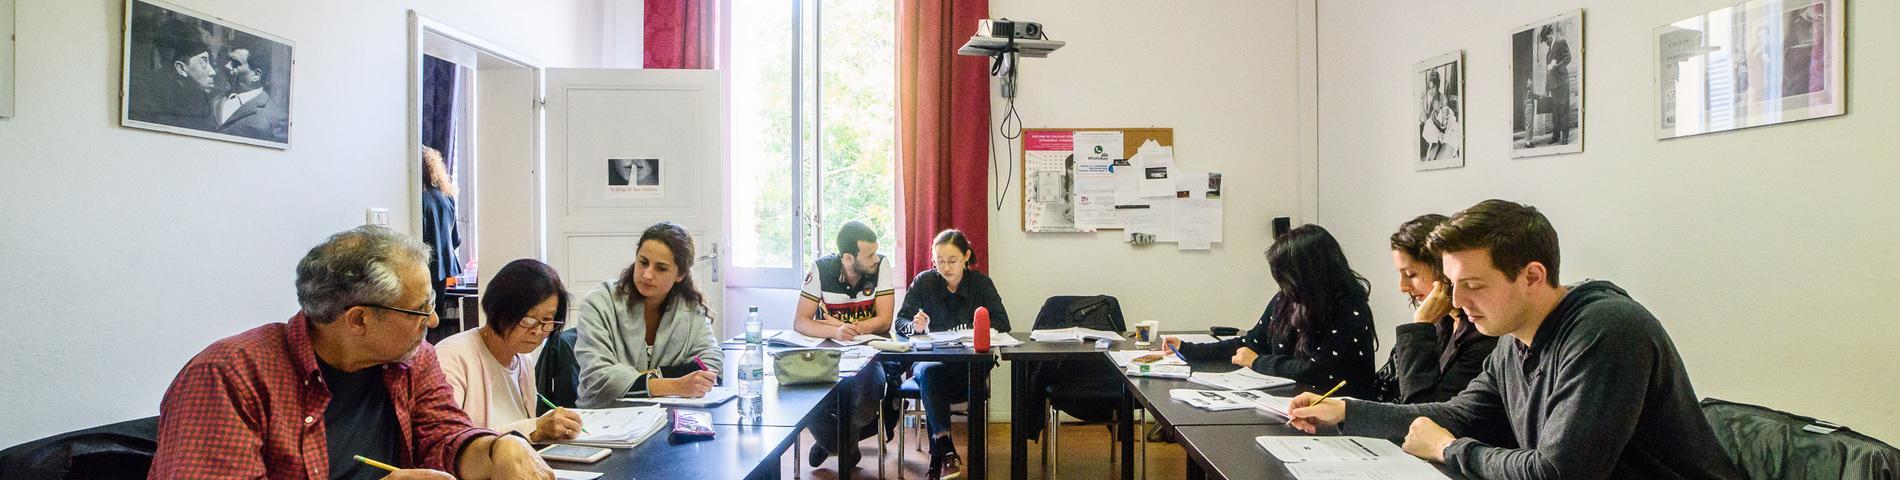 A.L.C.E. Accademia Lingue e Culture Europee صورة 1